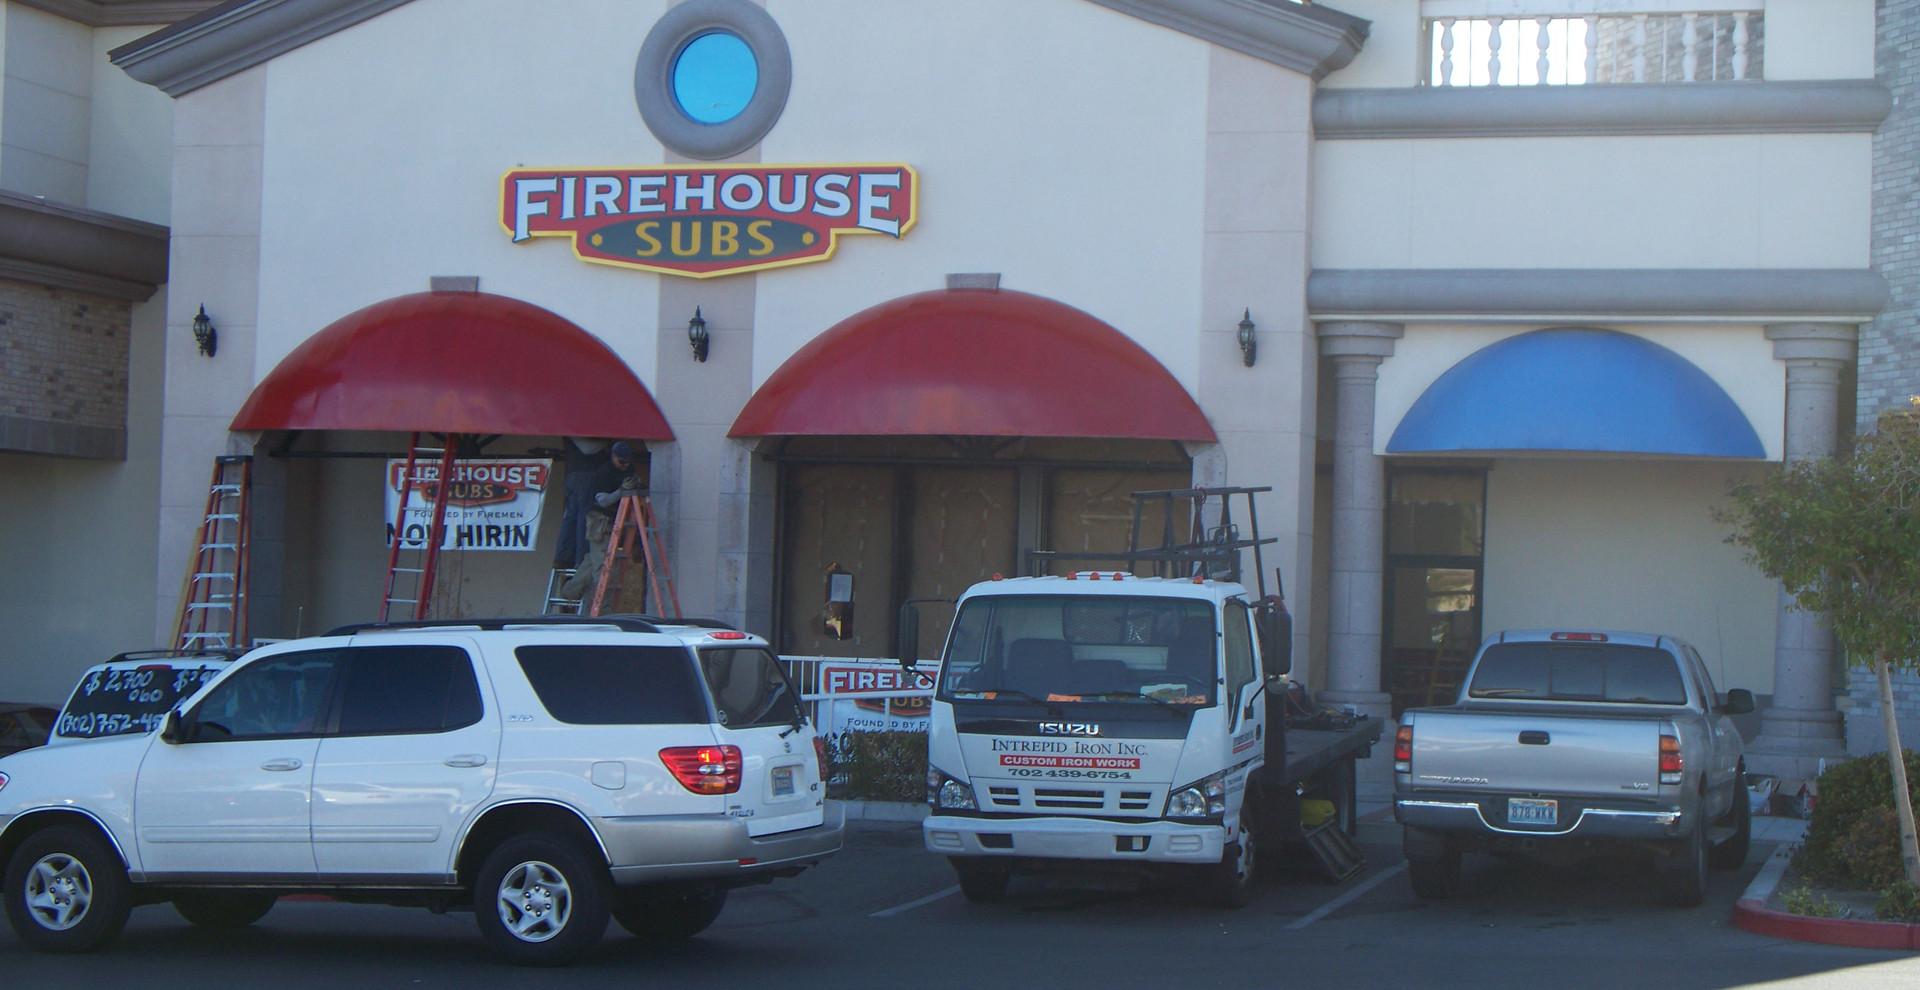 Awning FireHouse Subs Las Vegas - Intrepid Metal Works Inc.